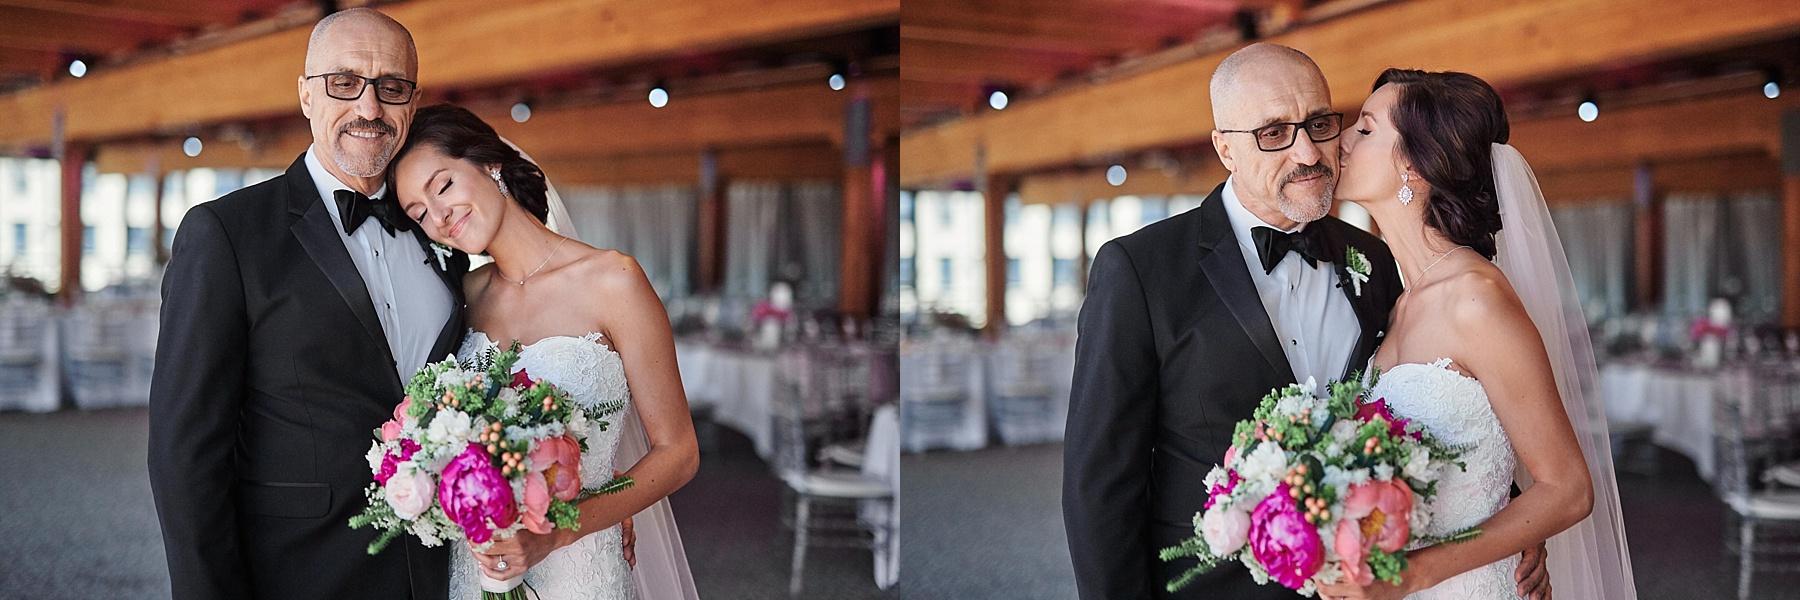 ABULAE-Wedding-Saint-paul-MN-Josh-Sofia-Wedding-Mears-Park_0739.jpg